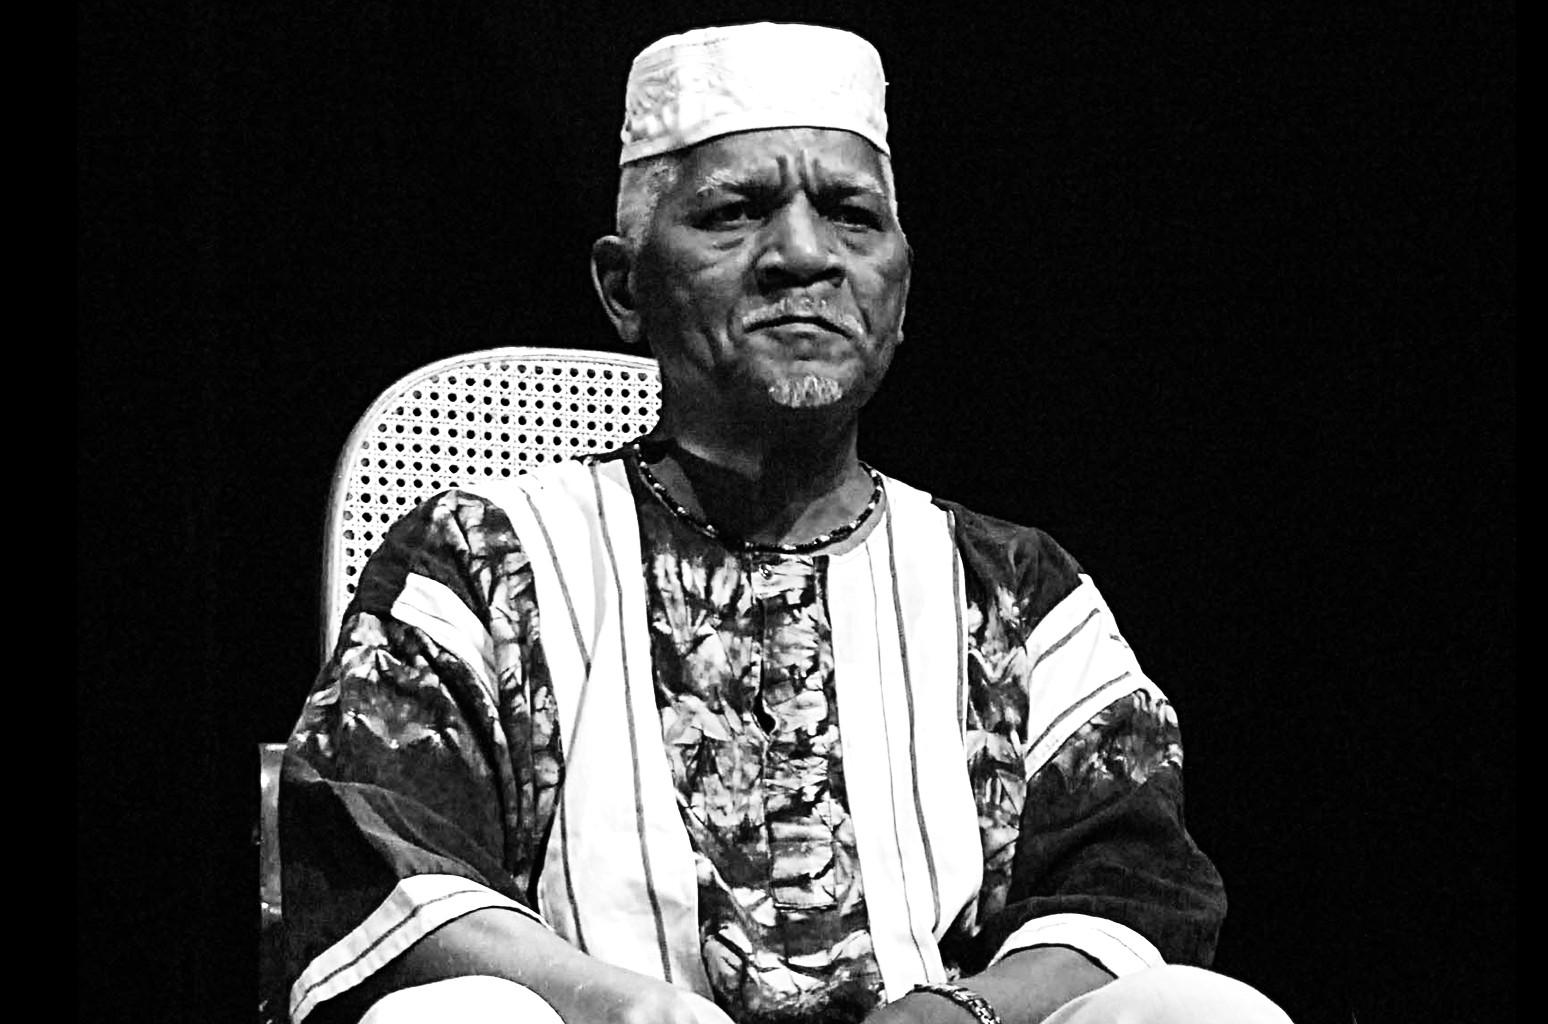 Baba Oje of Arrested Development